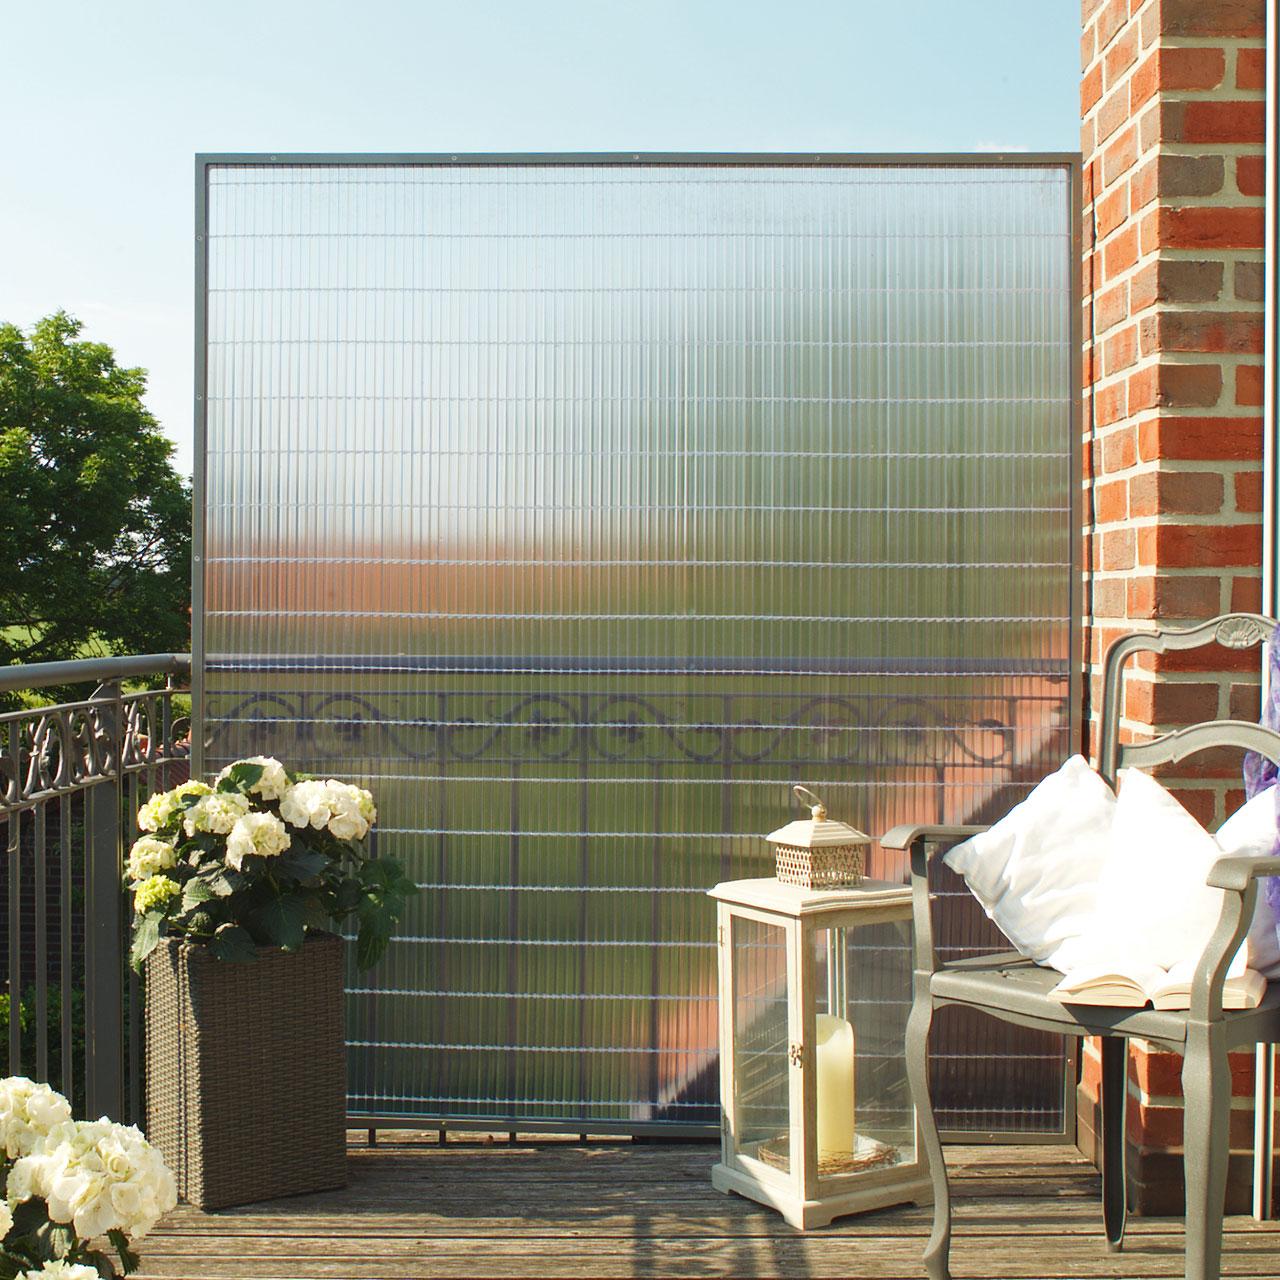 Sichtschutzzaun Pvc Kunststoff Sunline Transparent Sichtschutz Welt De